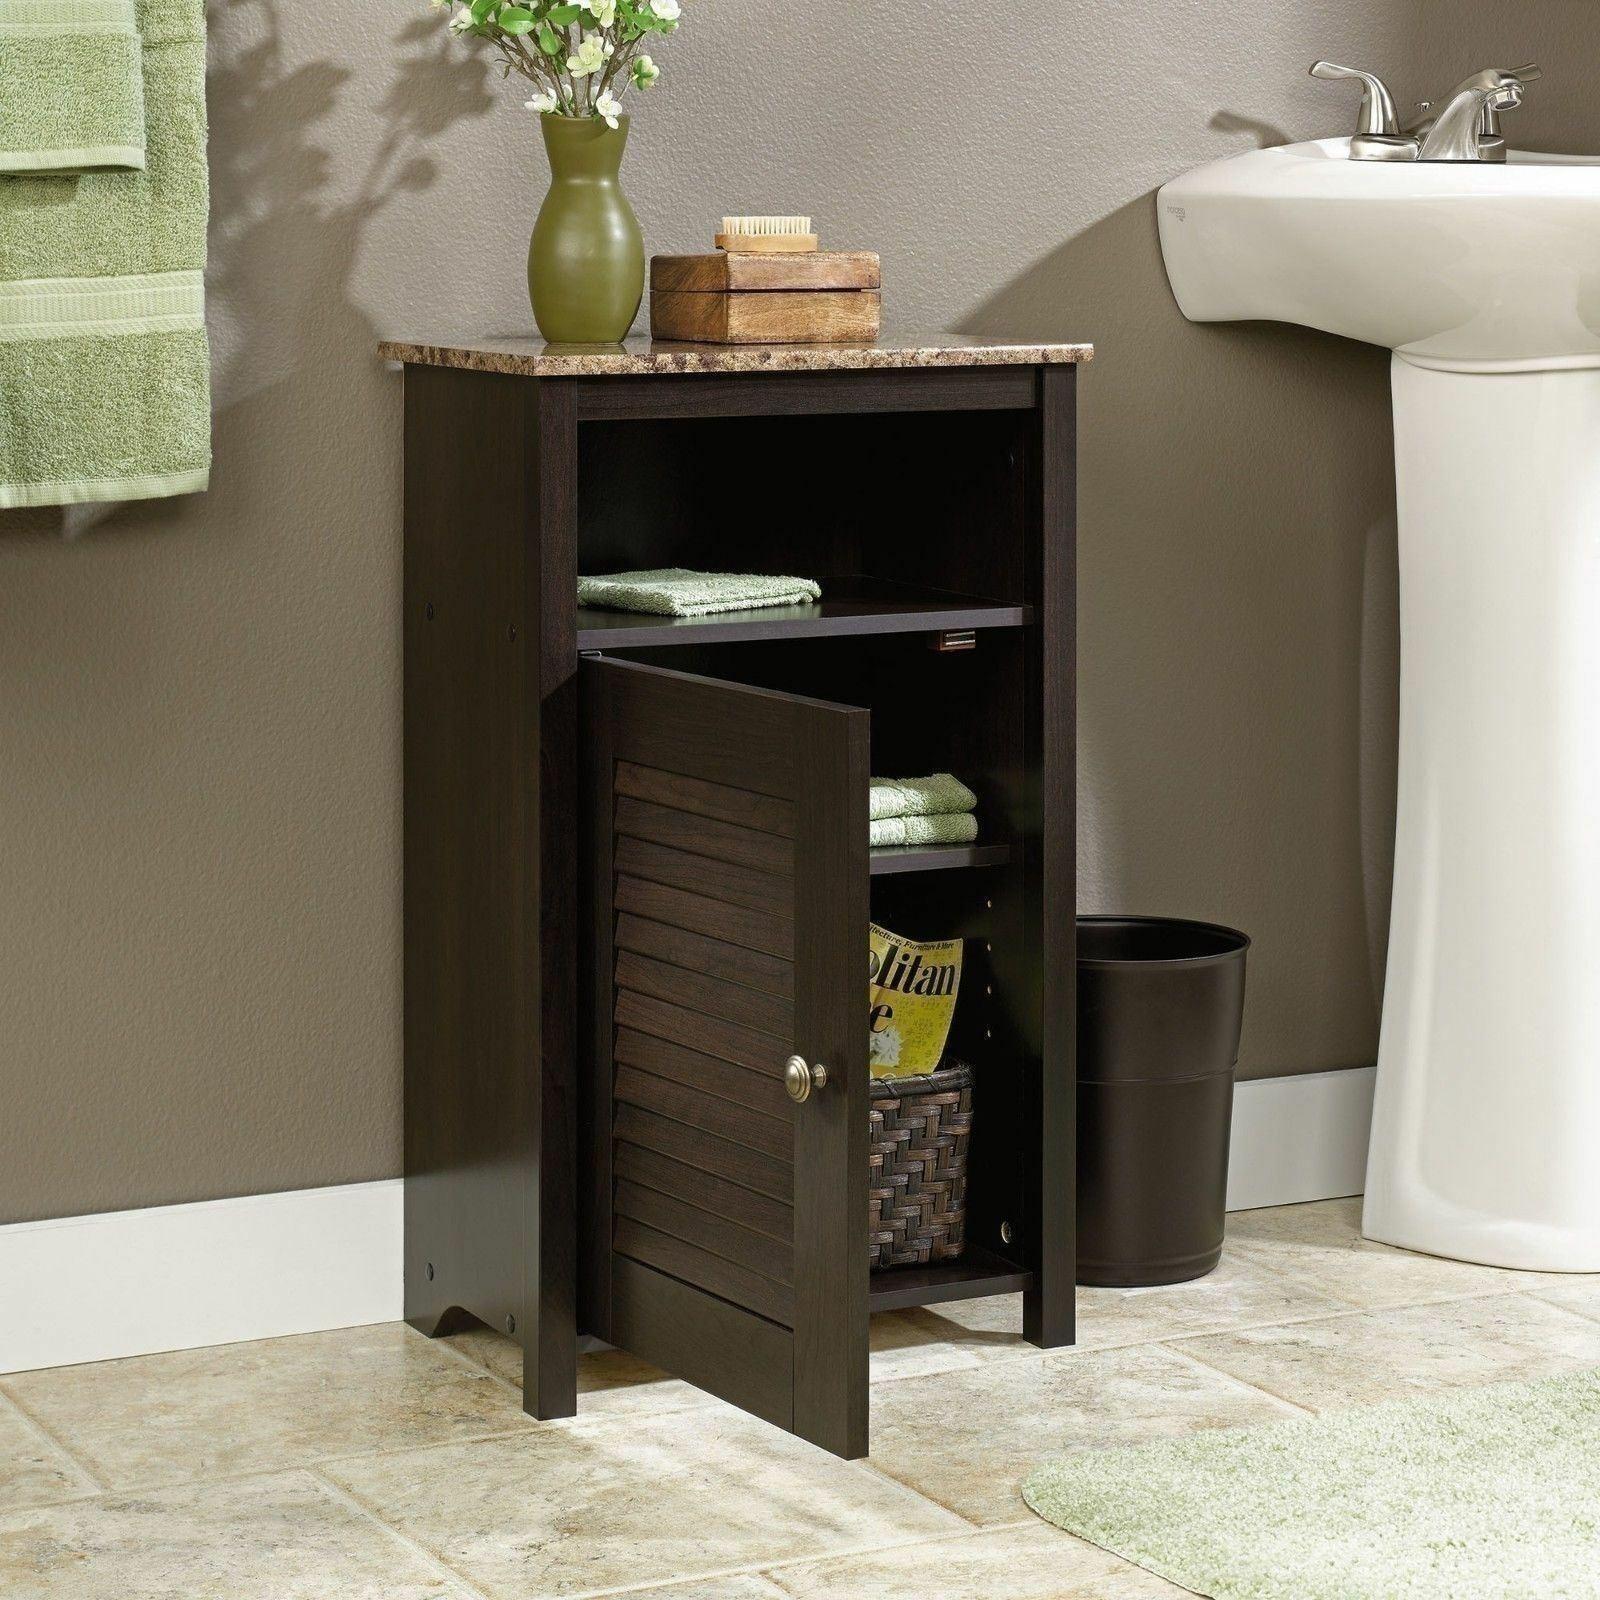 Dark Brown Bathroom Floor Cabinet Wooden Storage Organizer Towel Linen Shelves